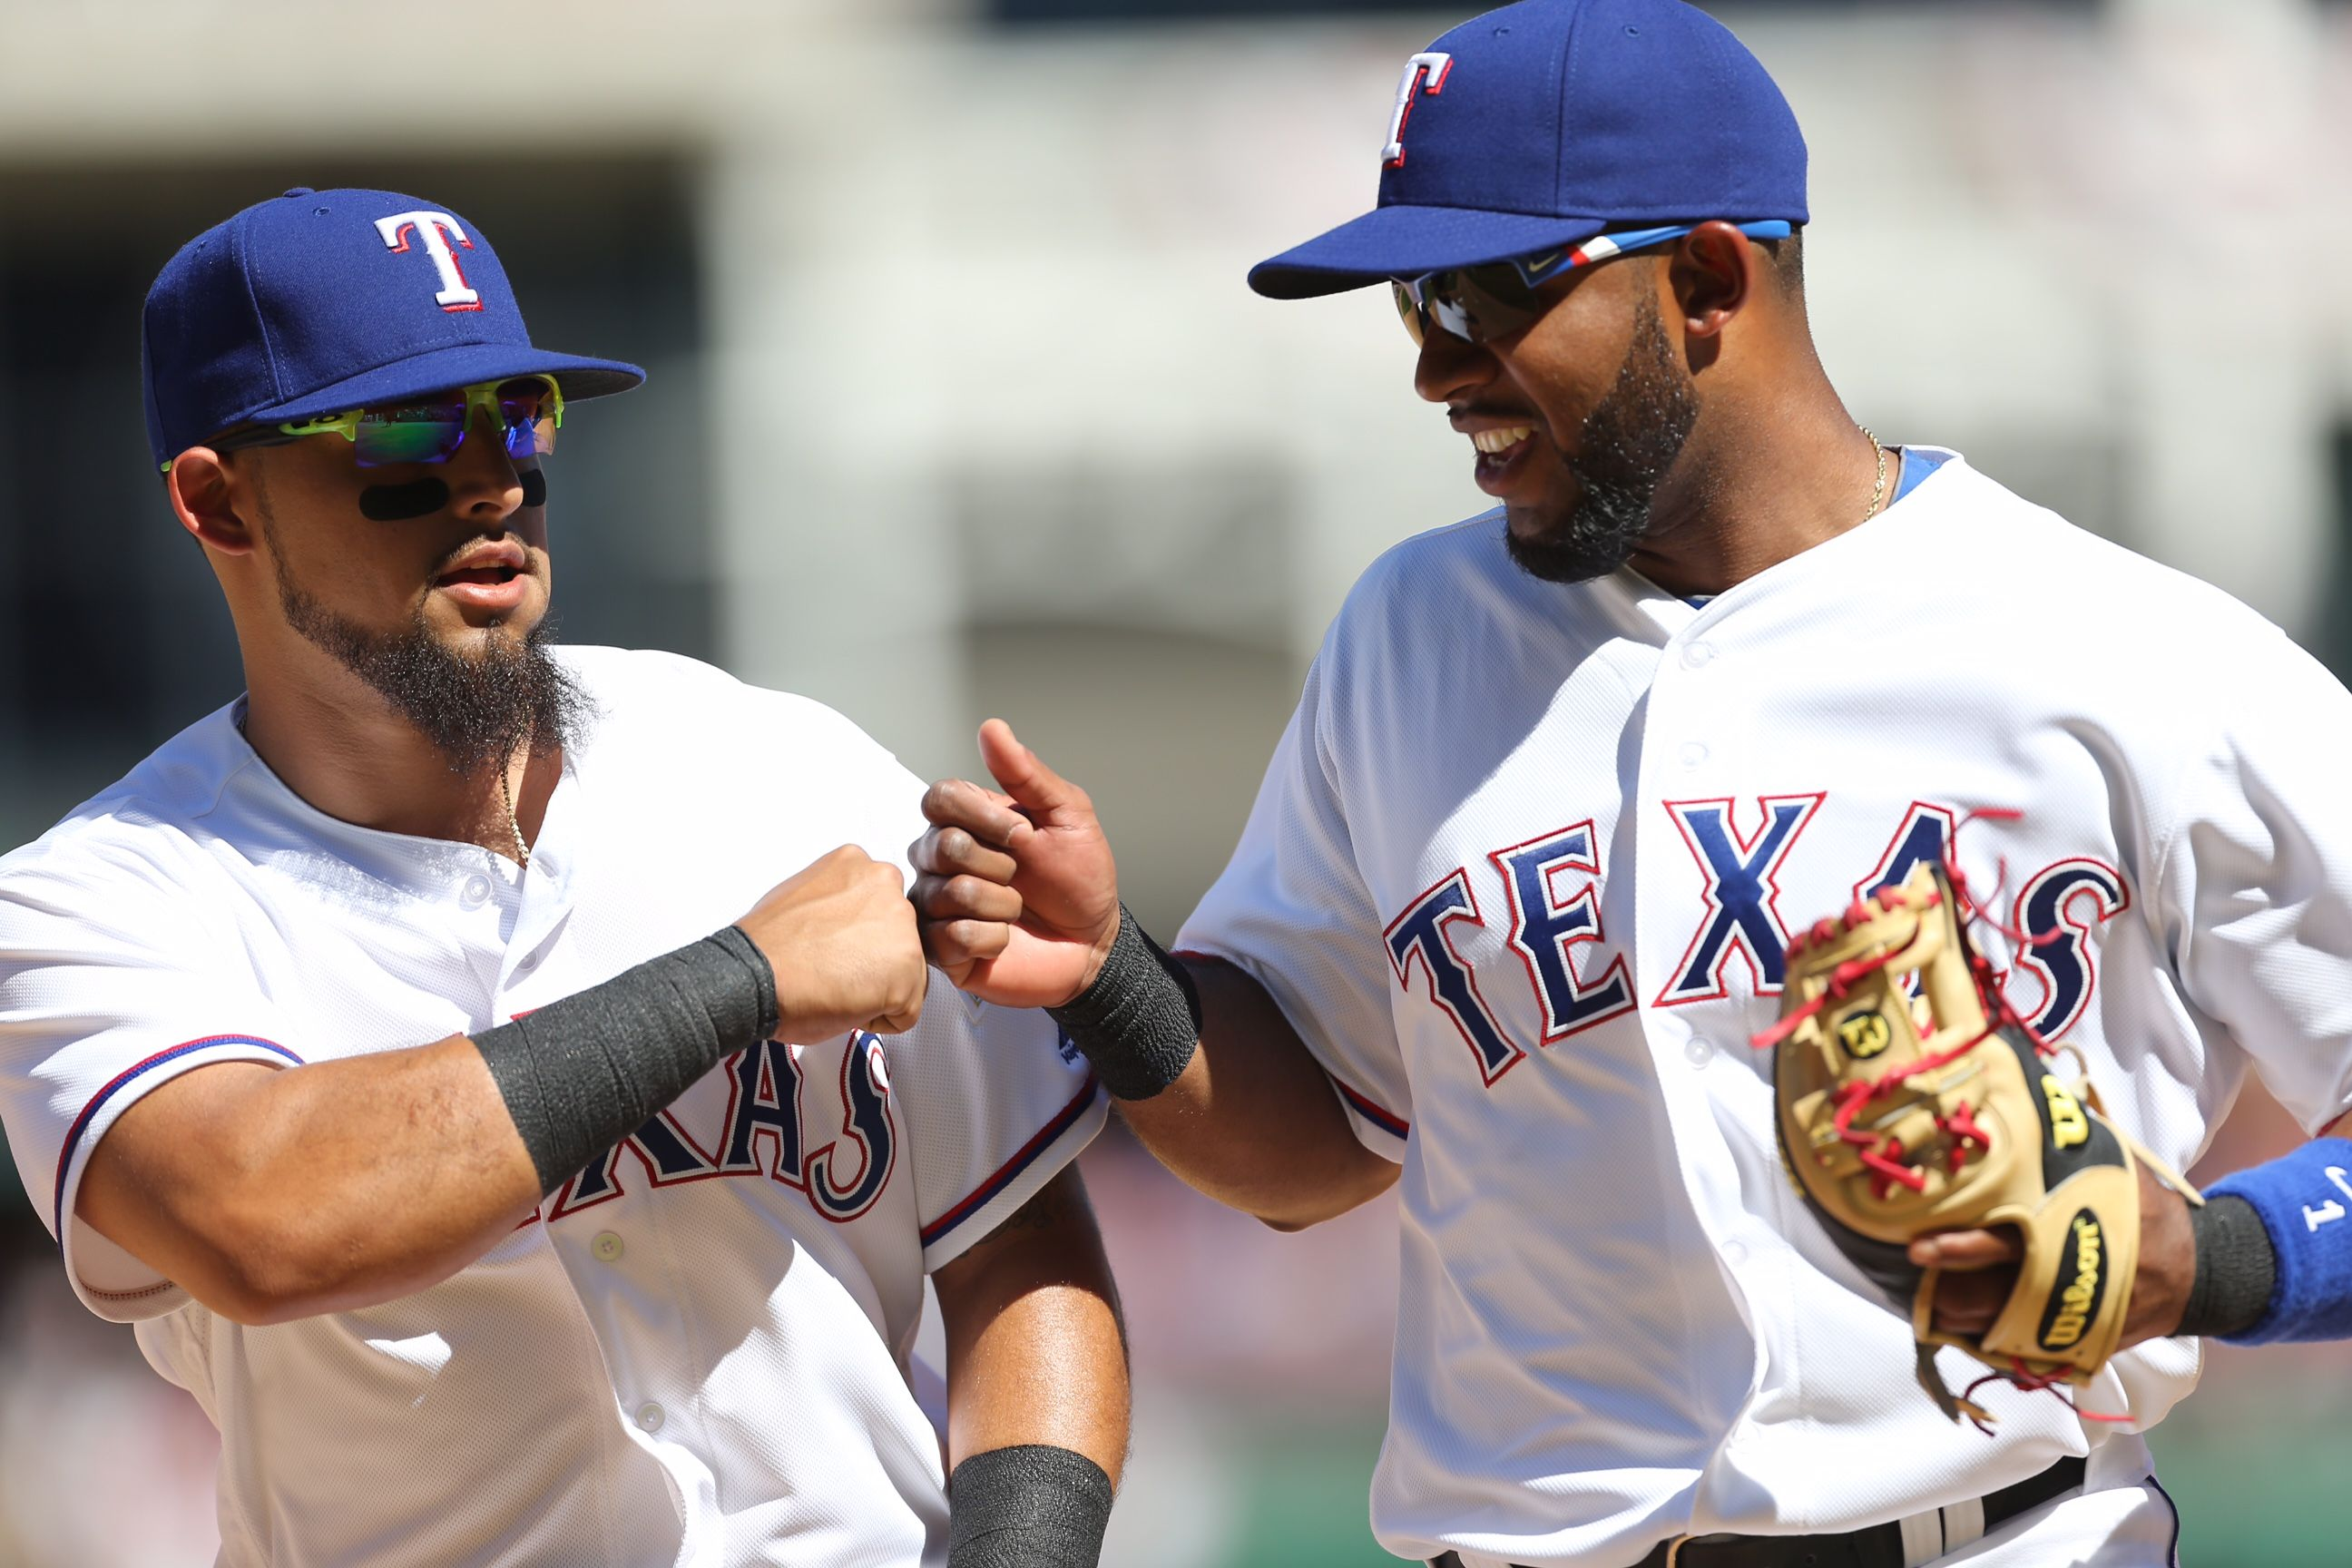 Knucks. RangersOpeningDay Texas rangers, Texas rangers